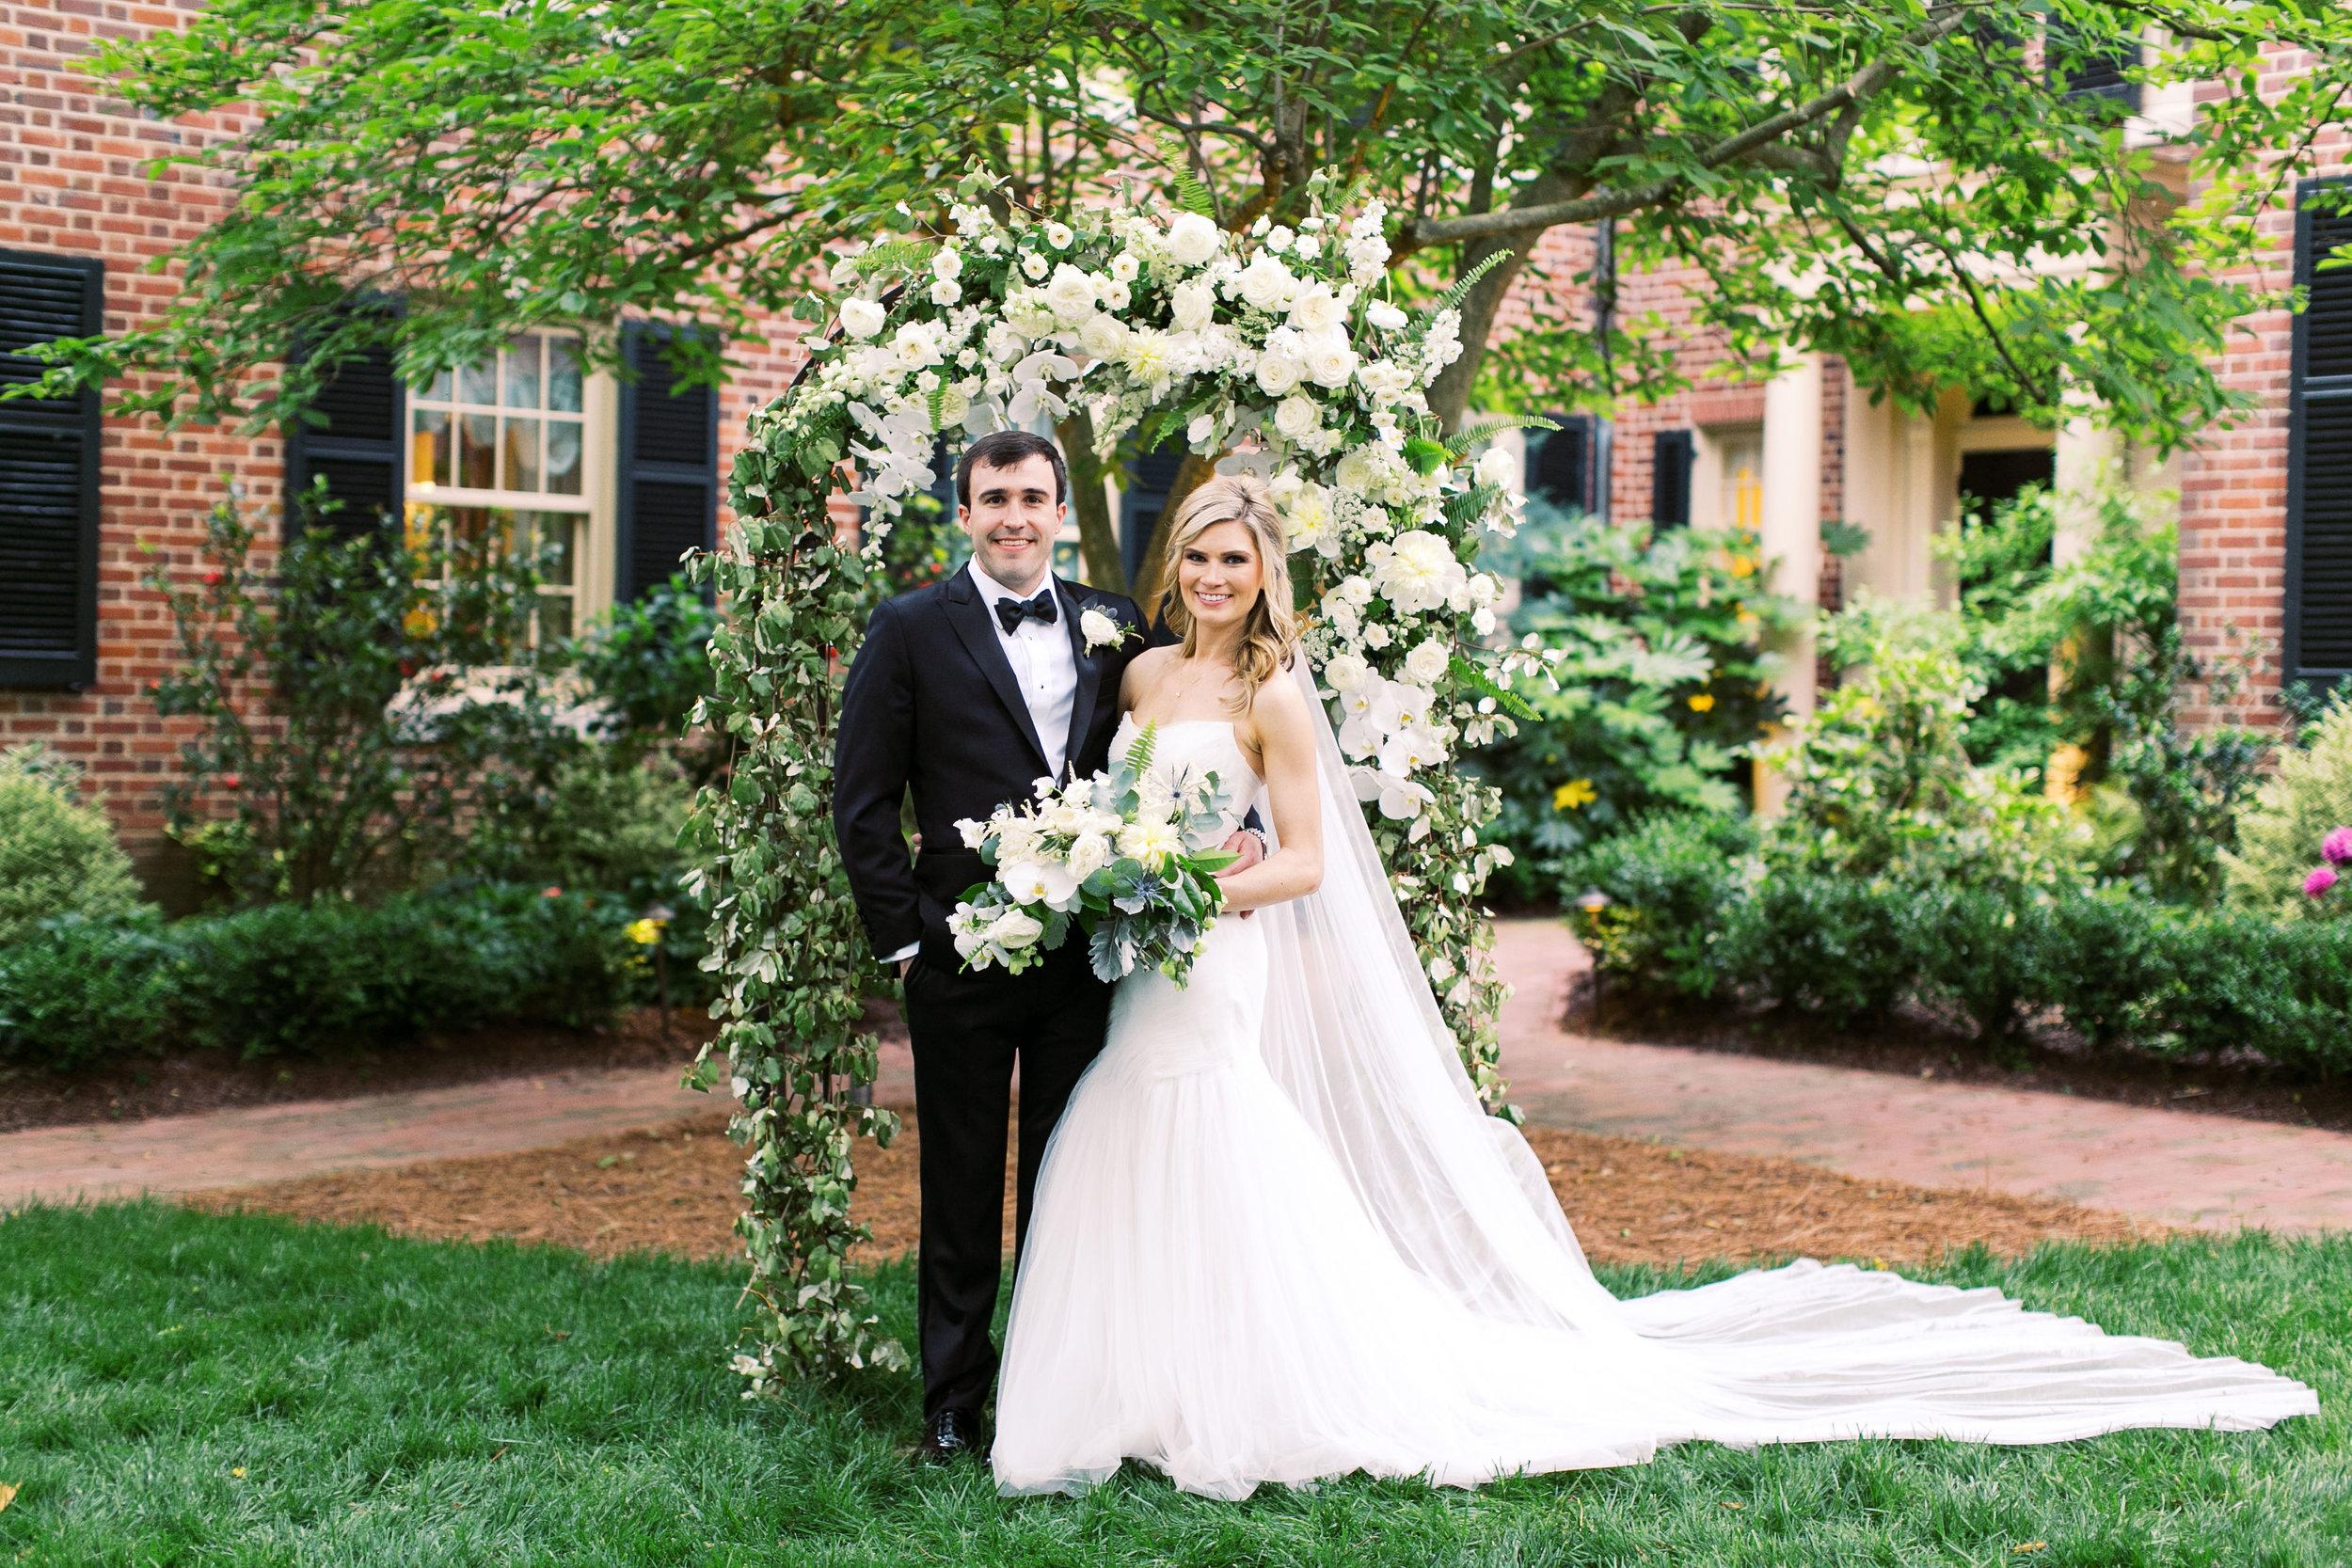 Courtney + Scott - Carolina Inn, Chapel Hill NC